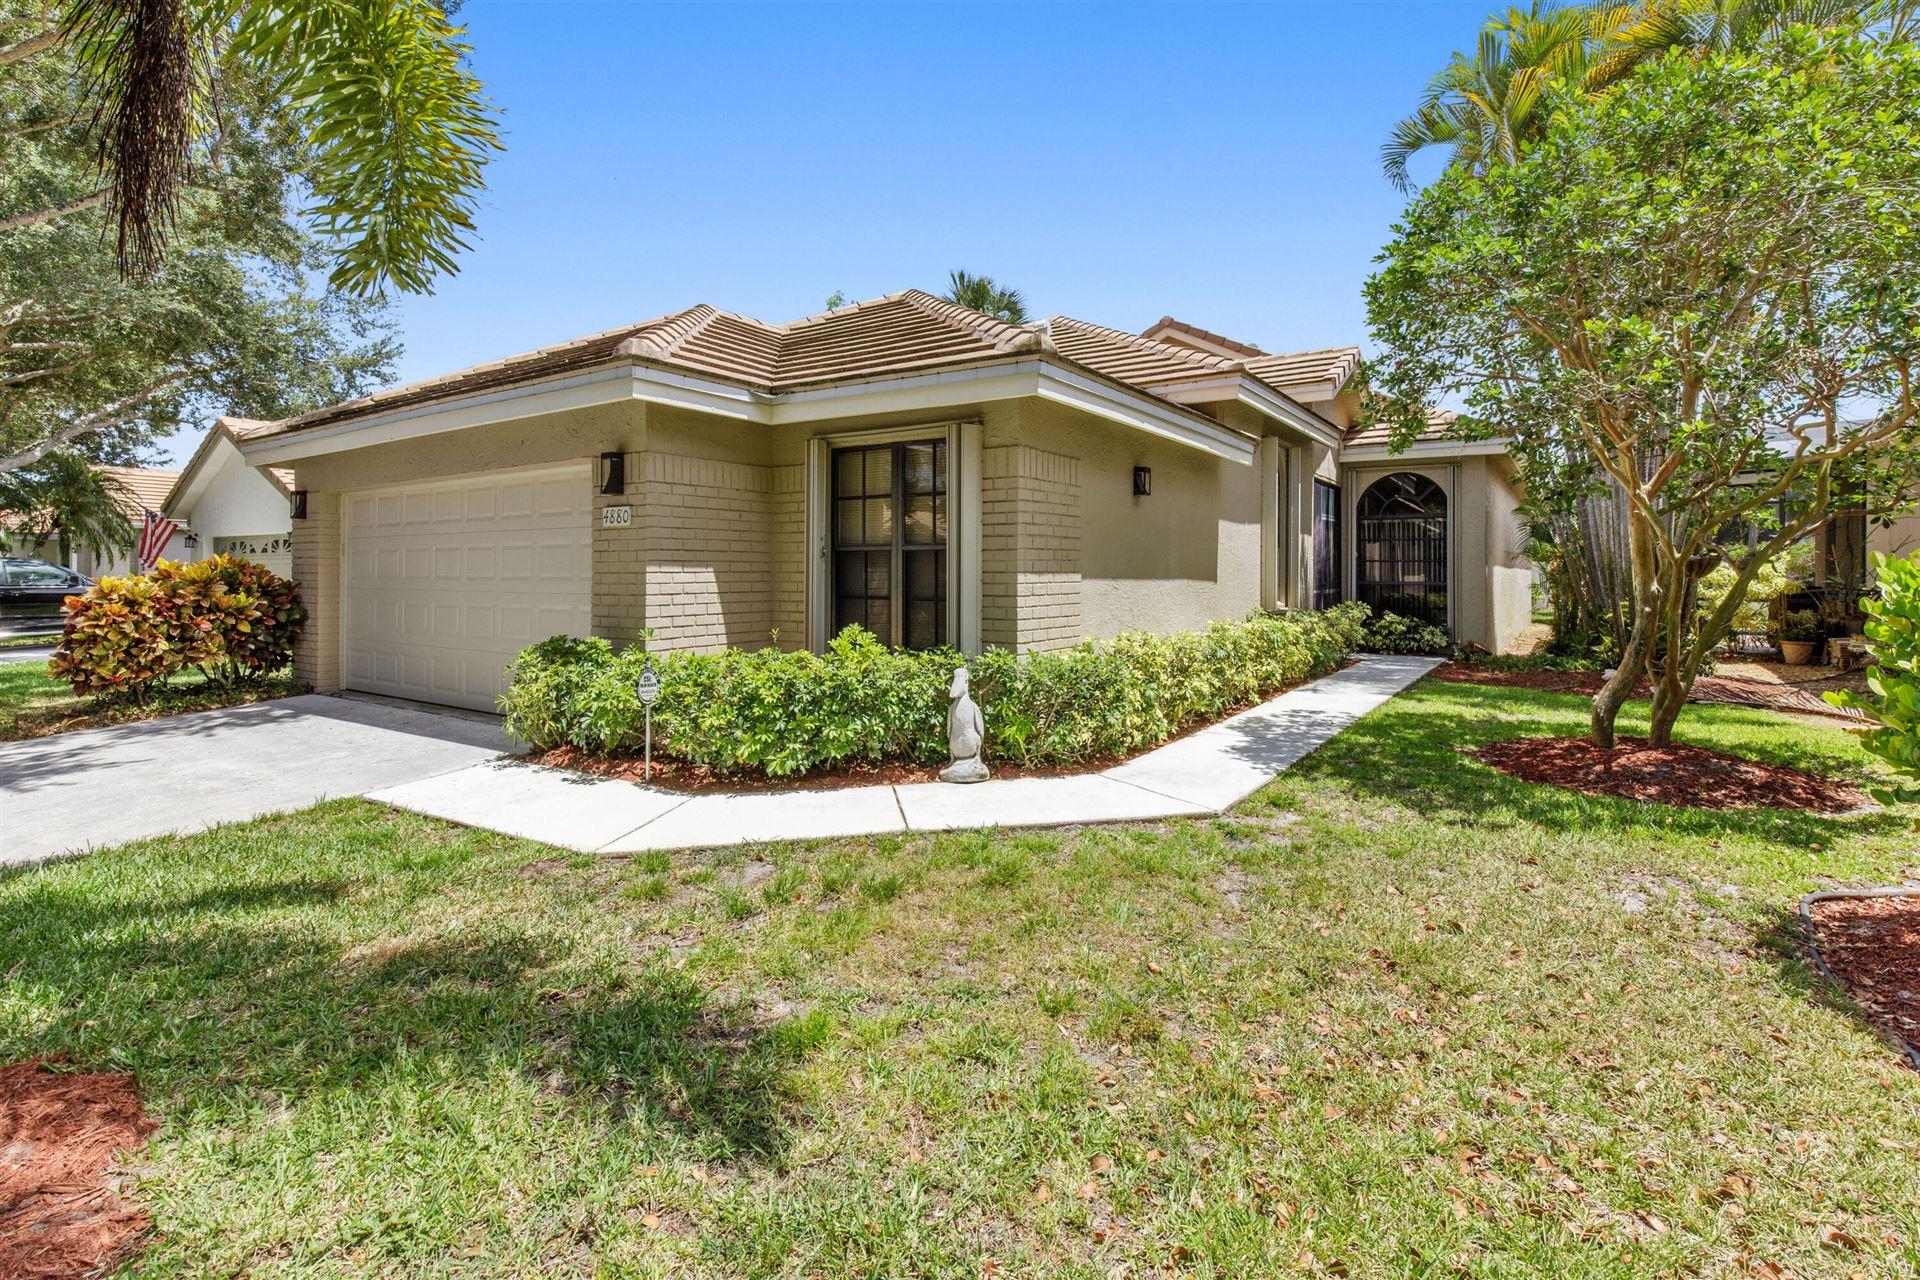 4880 Sherwood Forest Drive, Delray Beach, FL 33445 - MLS#: RX-10722994